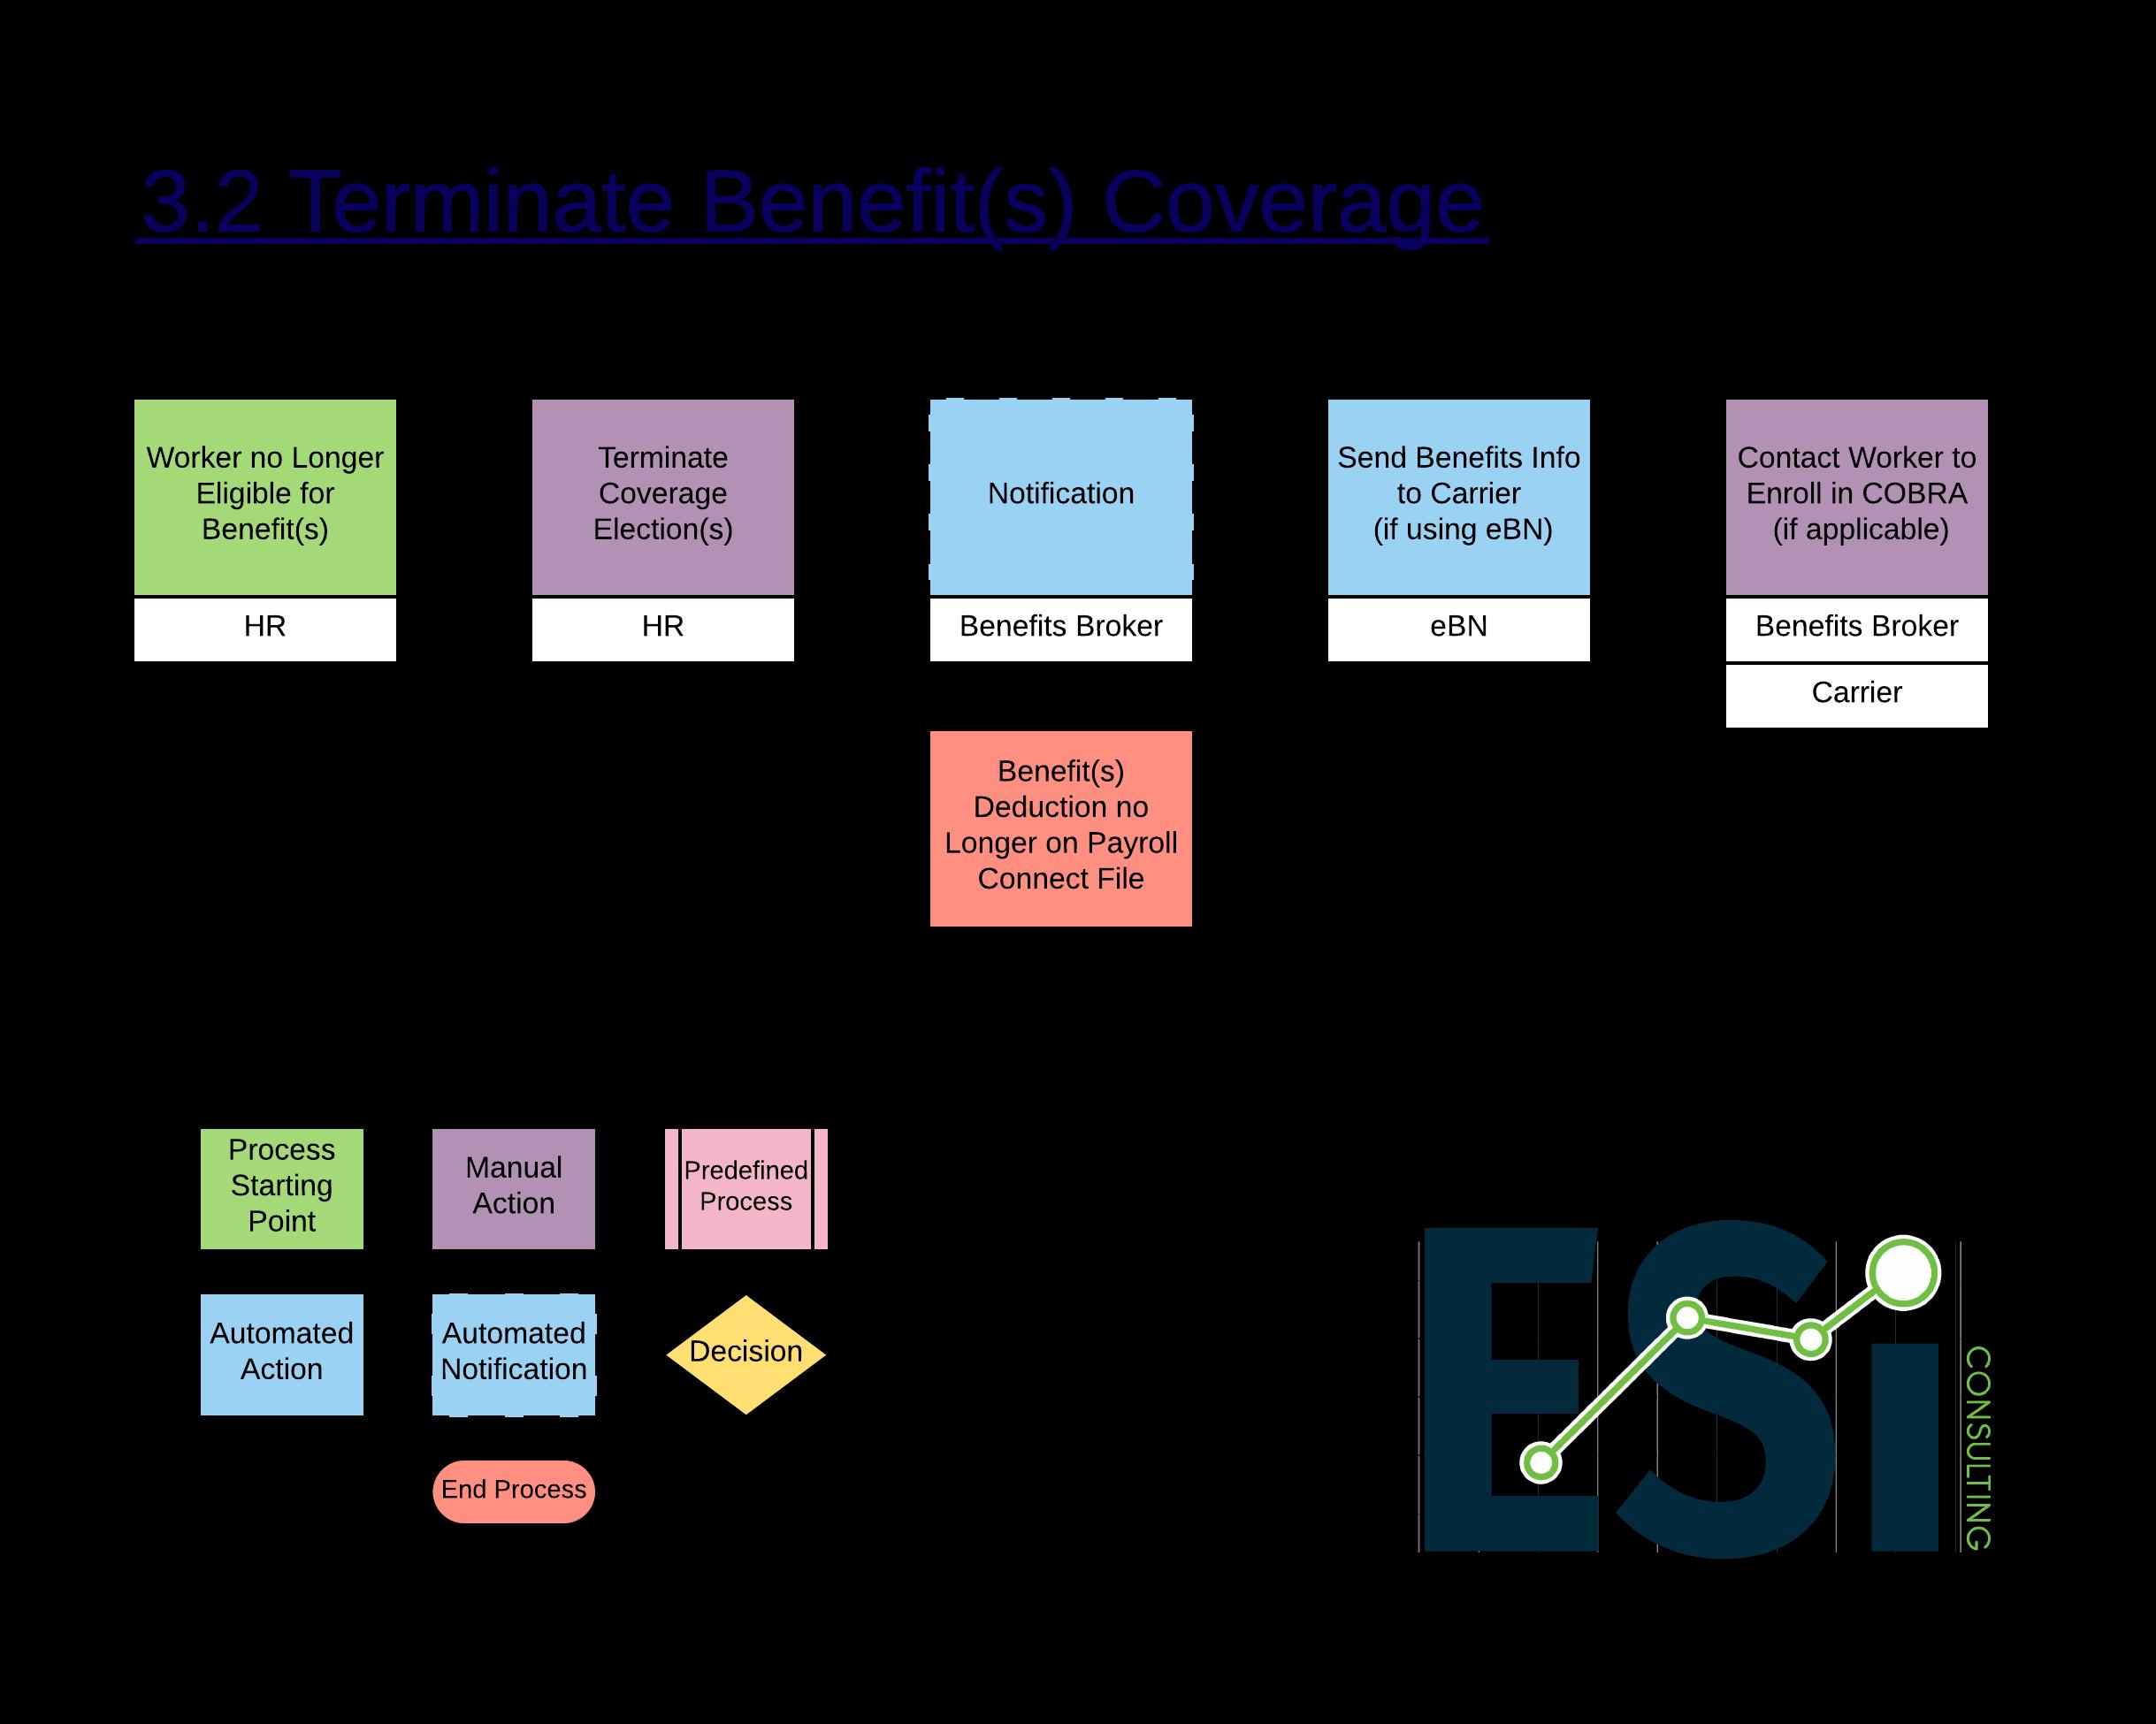 3.2 Terminate Benefit(s) Coverage -